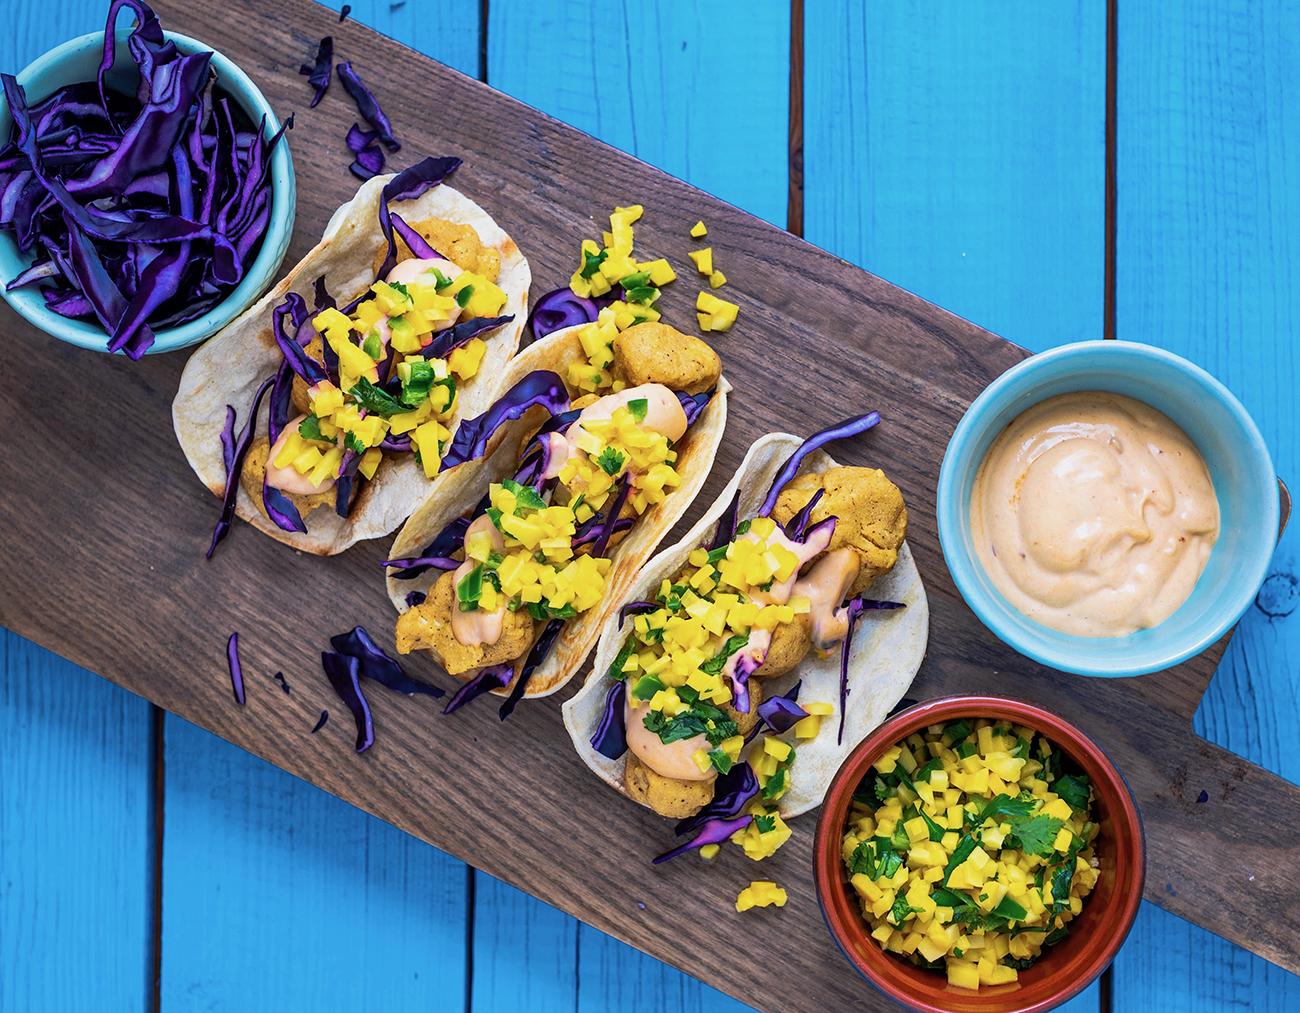 vegan Baja tacos by chef Eddie Garza